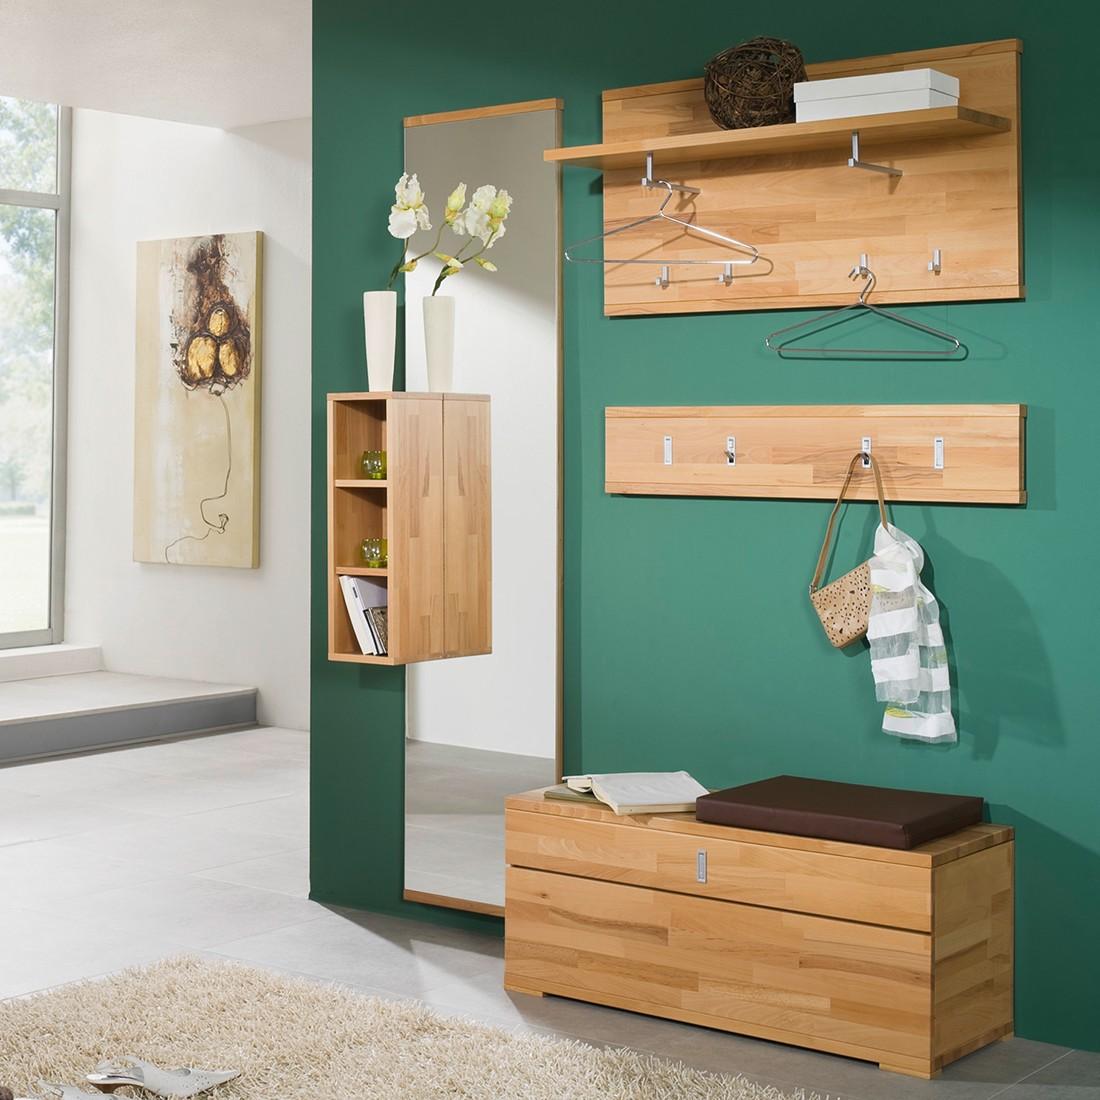 garderobenset vido ii 5 teilig kernbuche massiv jung s hne g nstig online kaufen. Black Bedroom Furniture Sets. Home Design Ideas